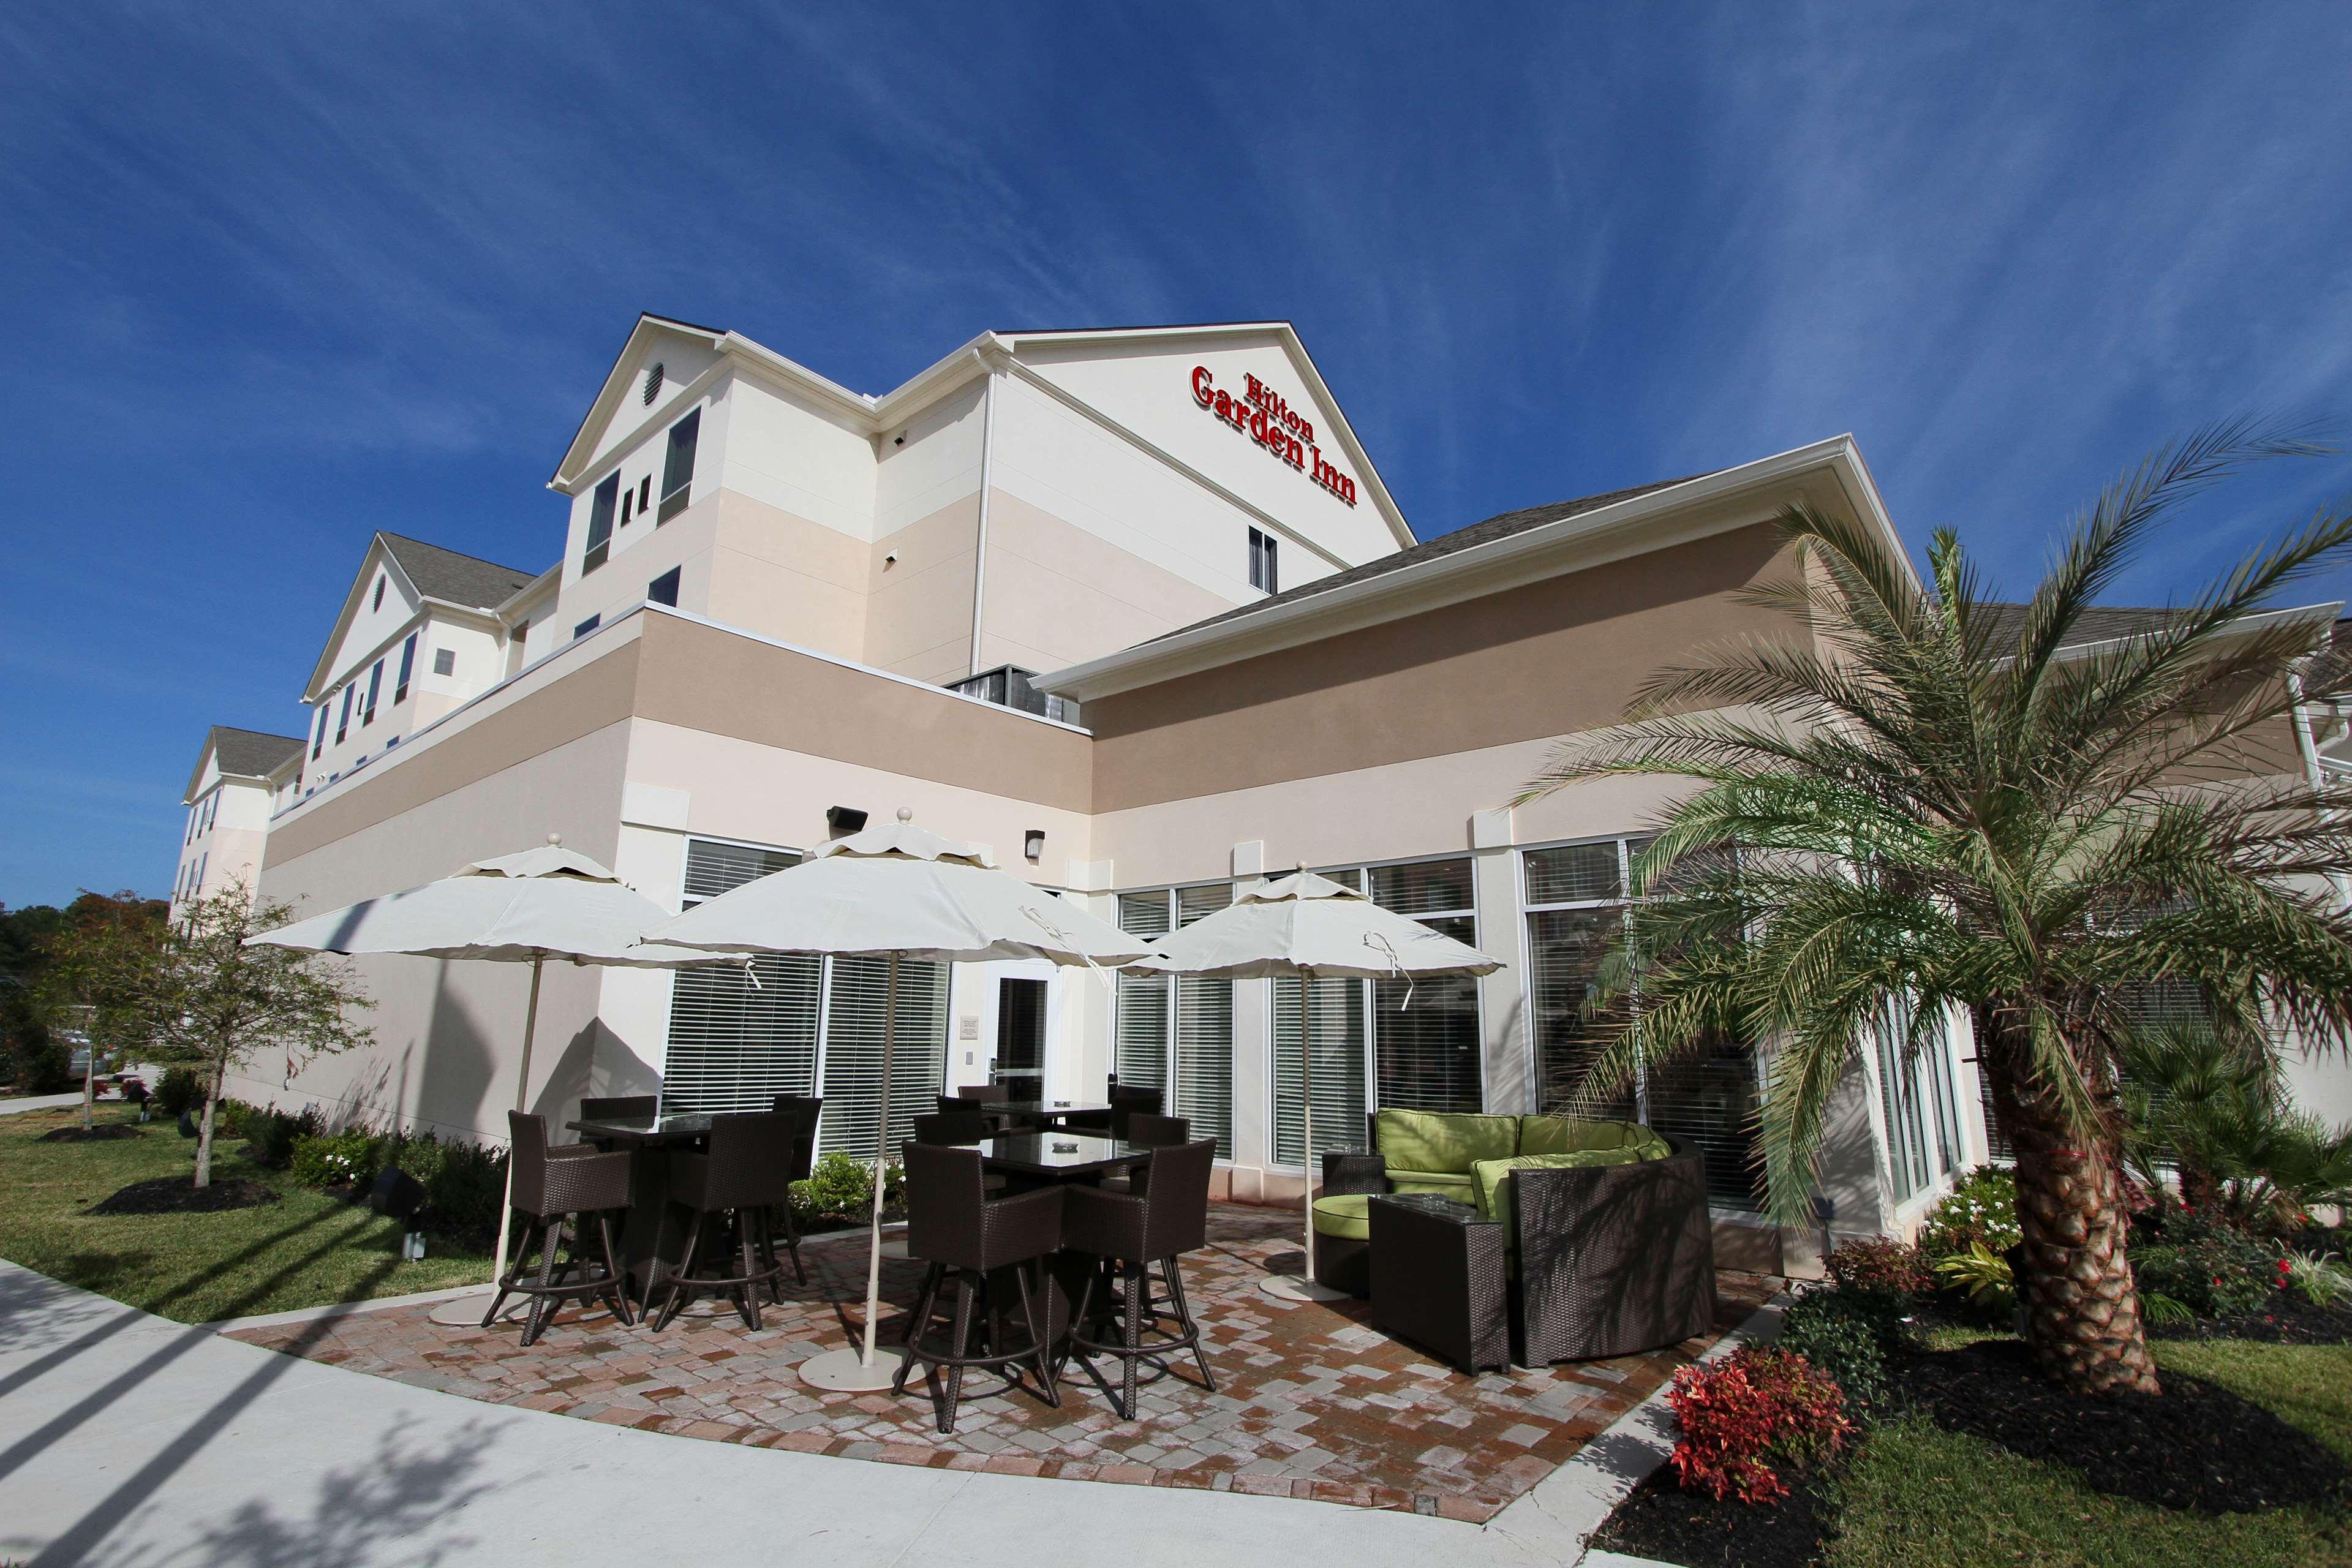 Hilton Garden Inn Covington/Mandeville image 1